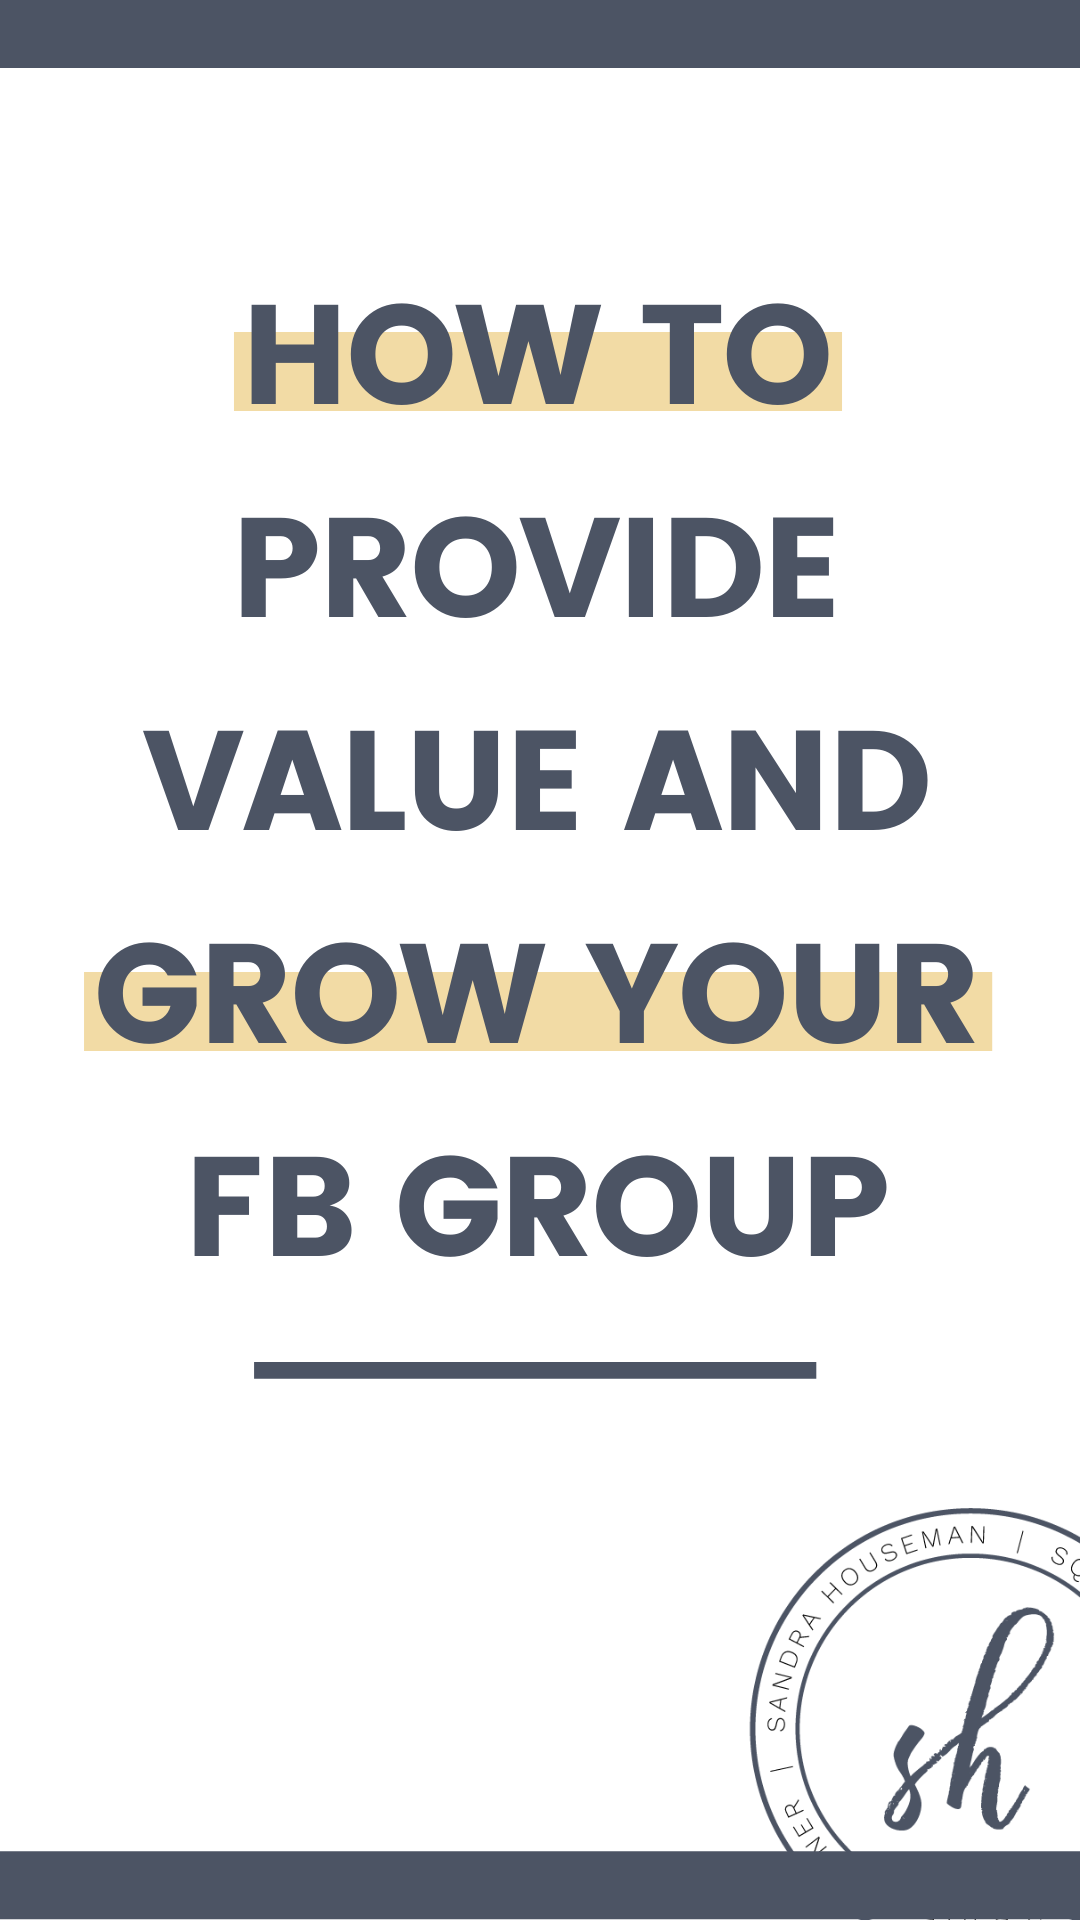 7 secrets to grow a Facebook group on autopilot Work